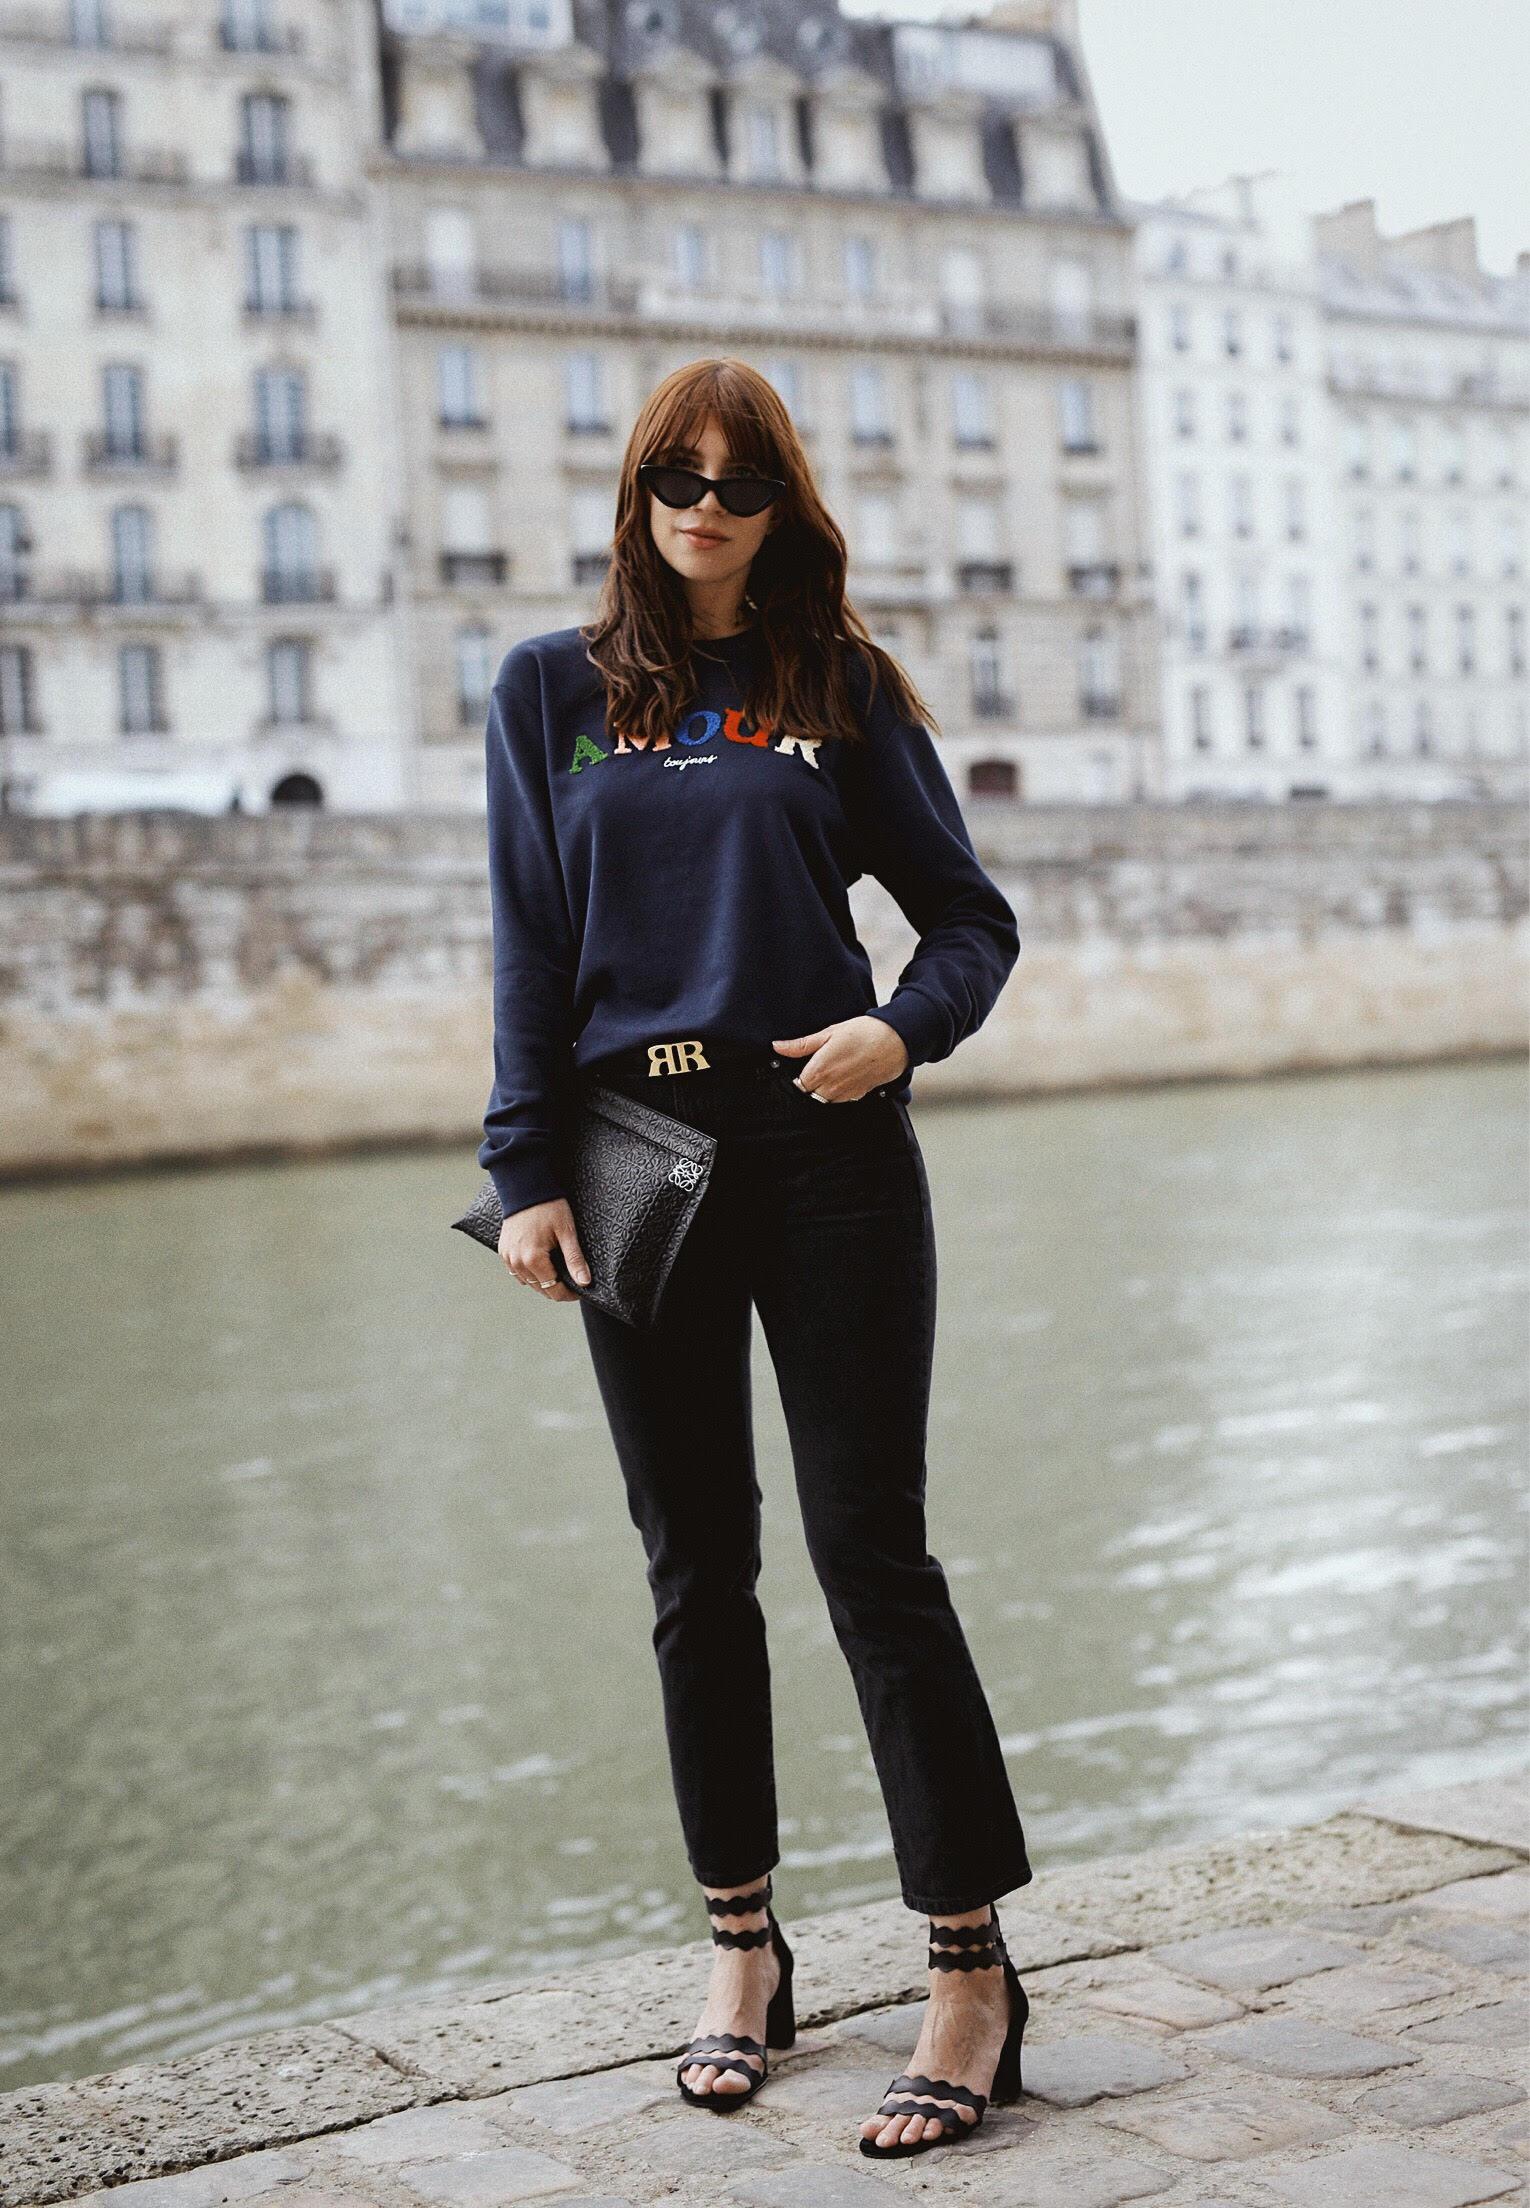 outfit paris other stories paris amour toujours sweater mint&berry sandals rouje jeans lesfillesenrouje catsanddogsblog ricarda schernus max bechmann fotografie film 2